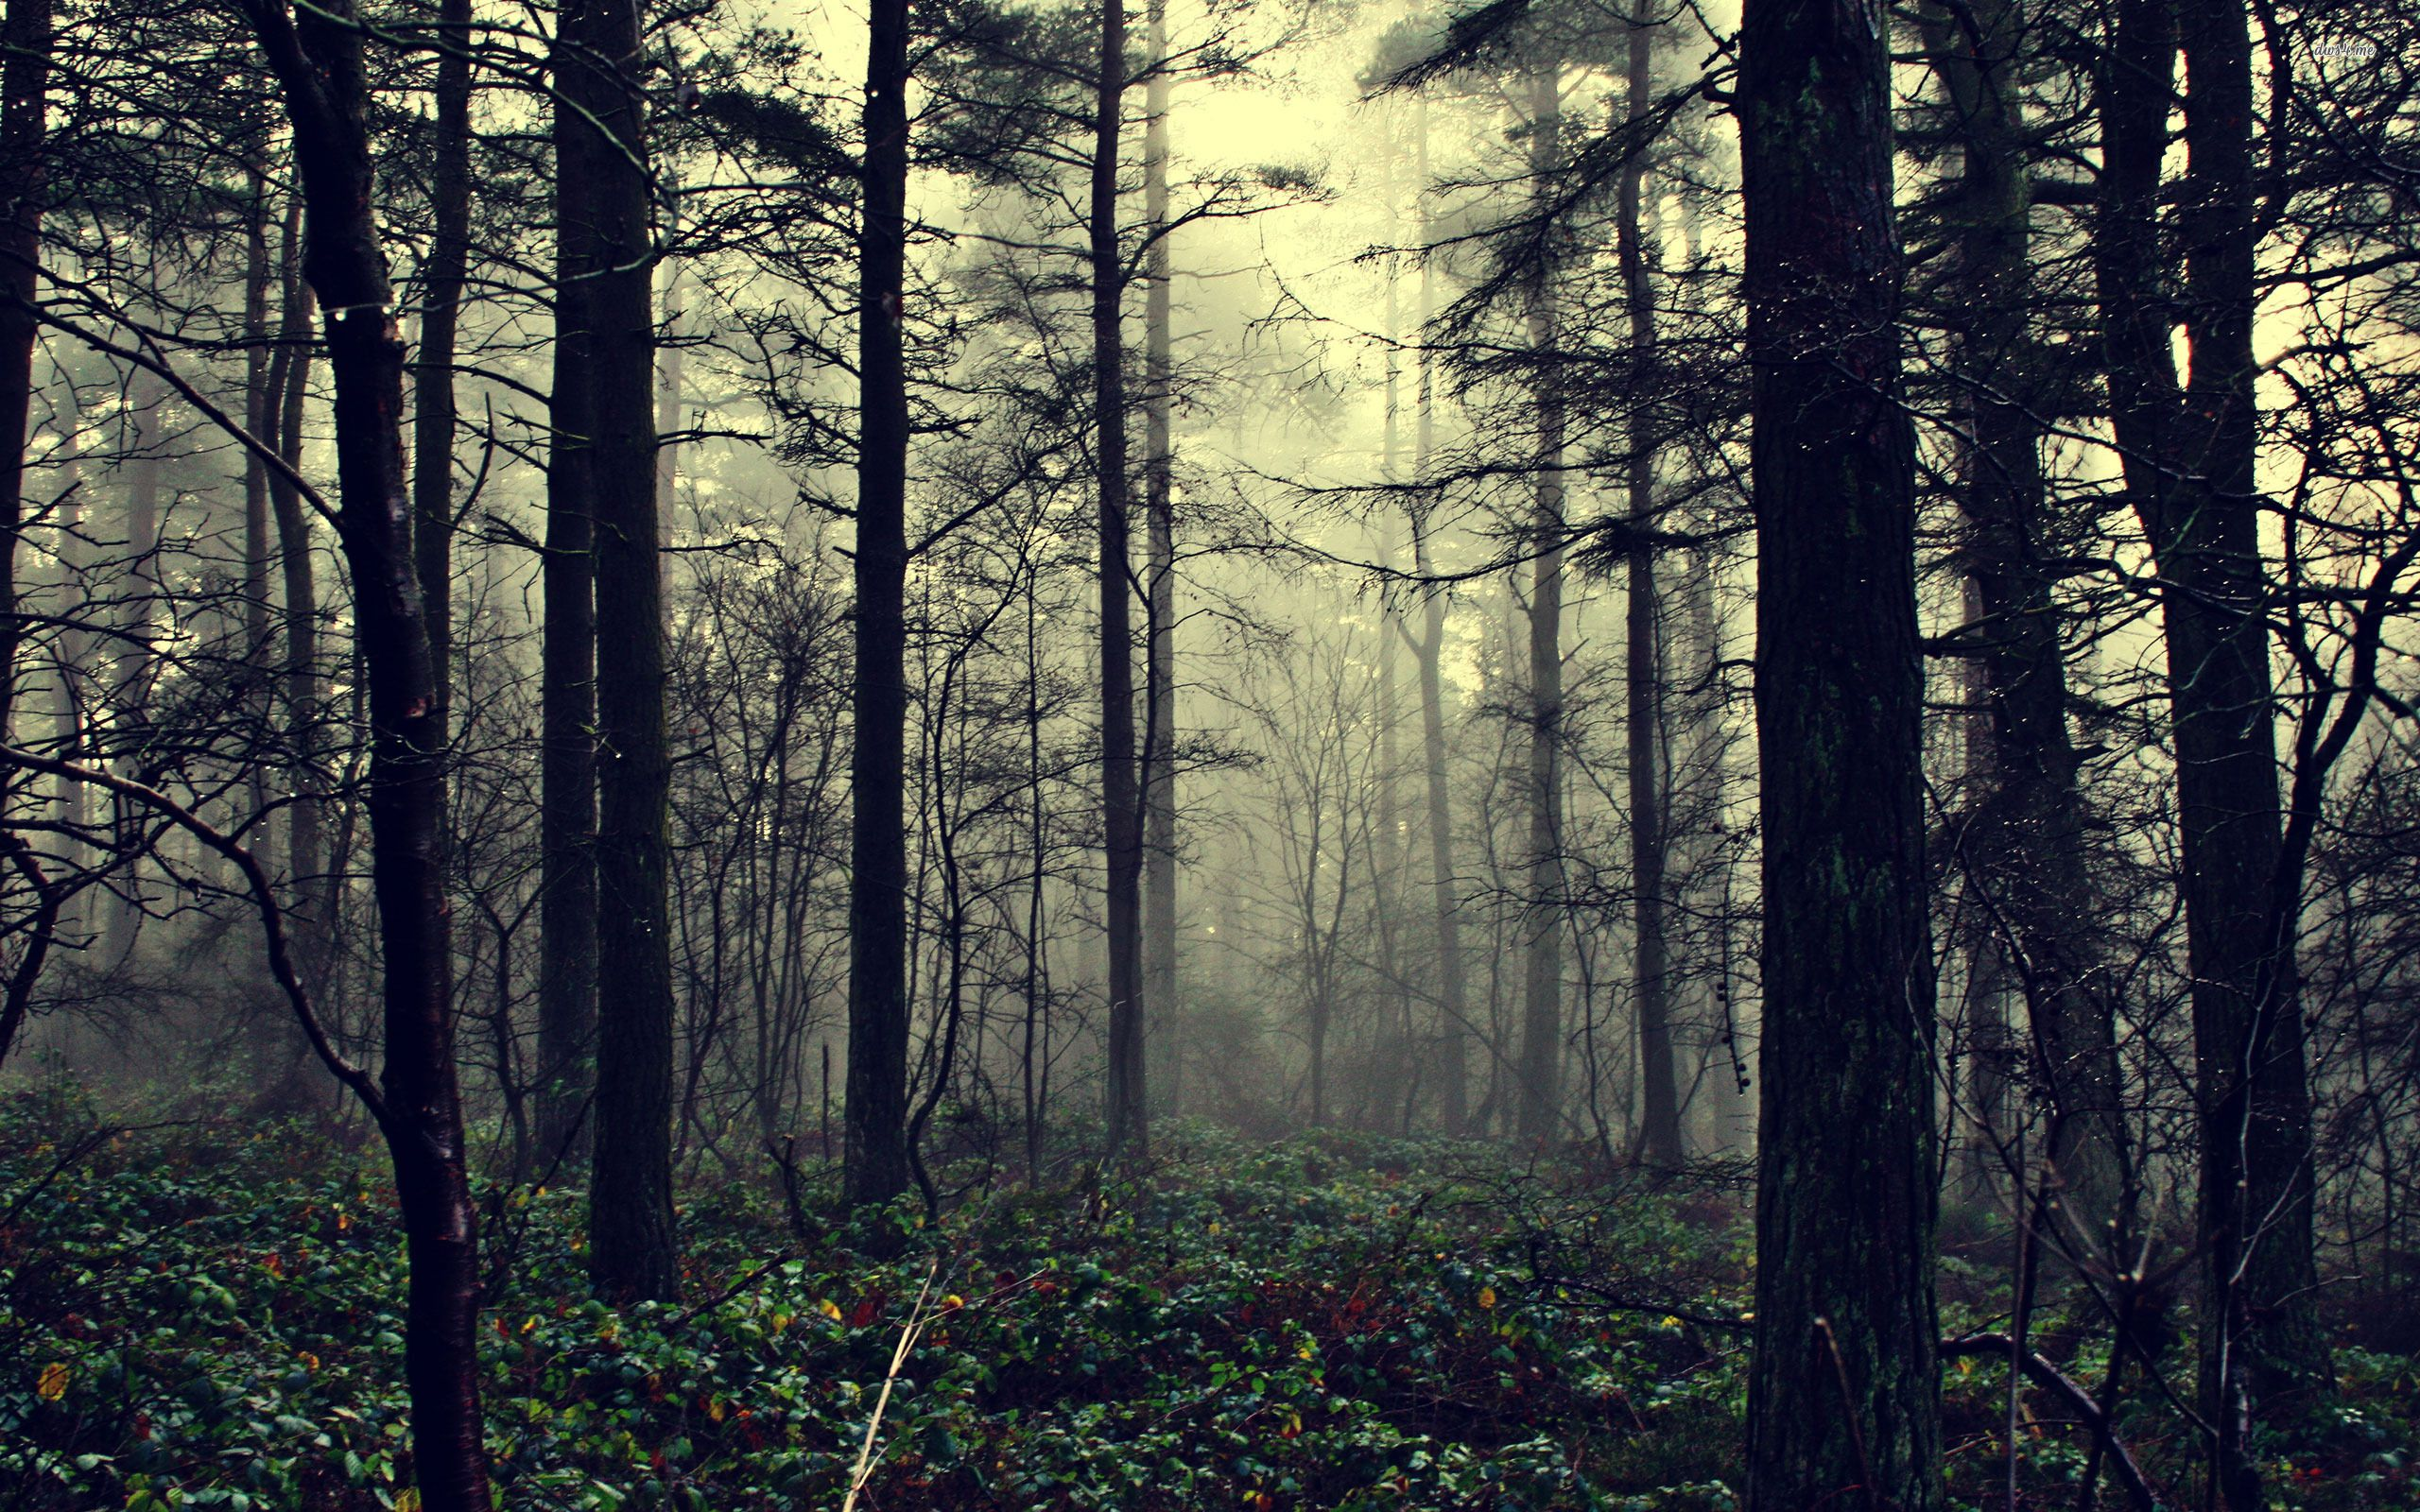 forest background hd - Google Search | Wakakiri~Snow White ...